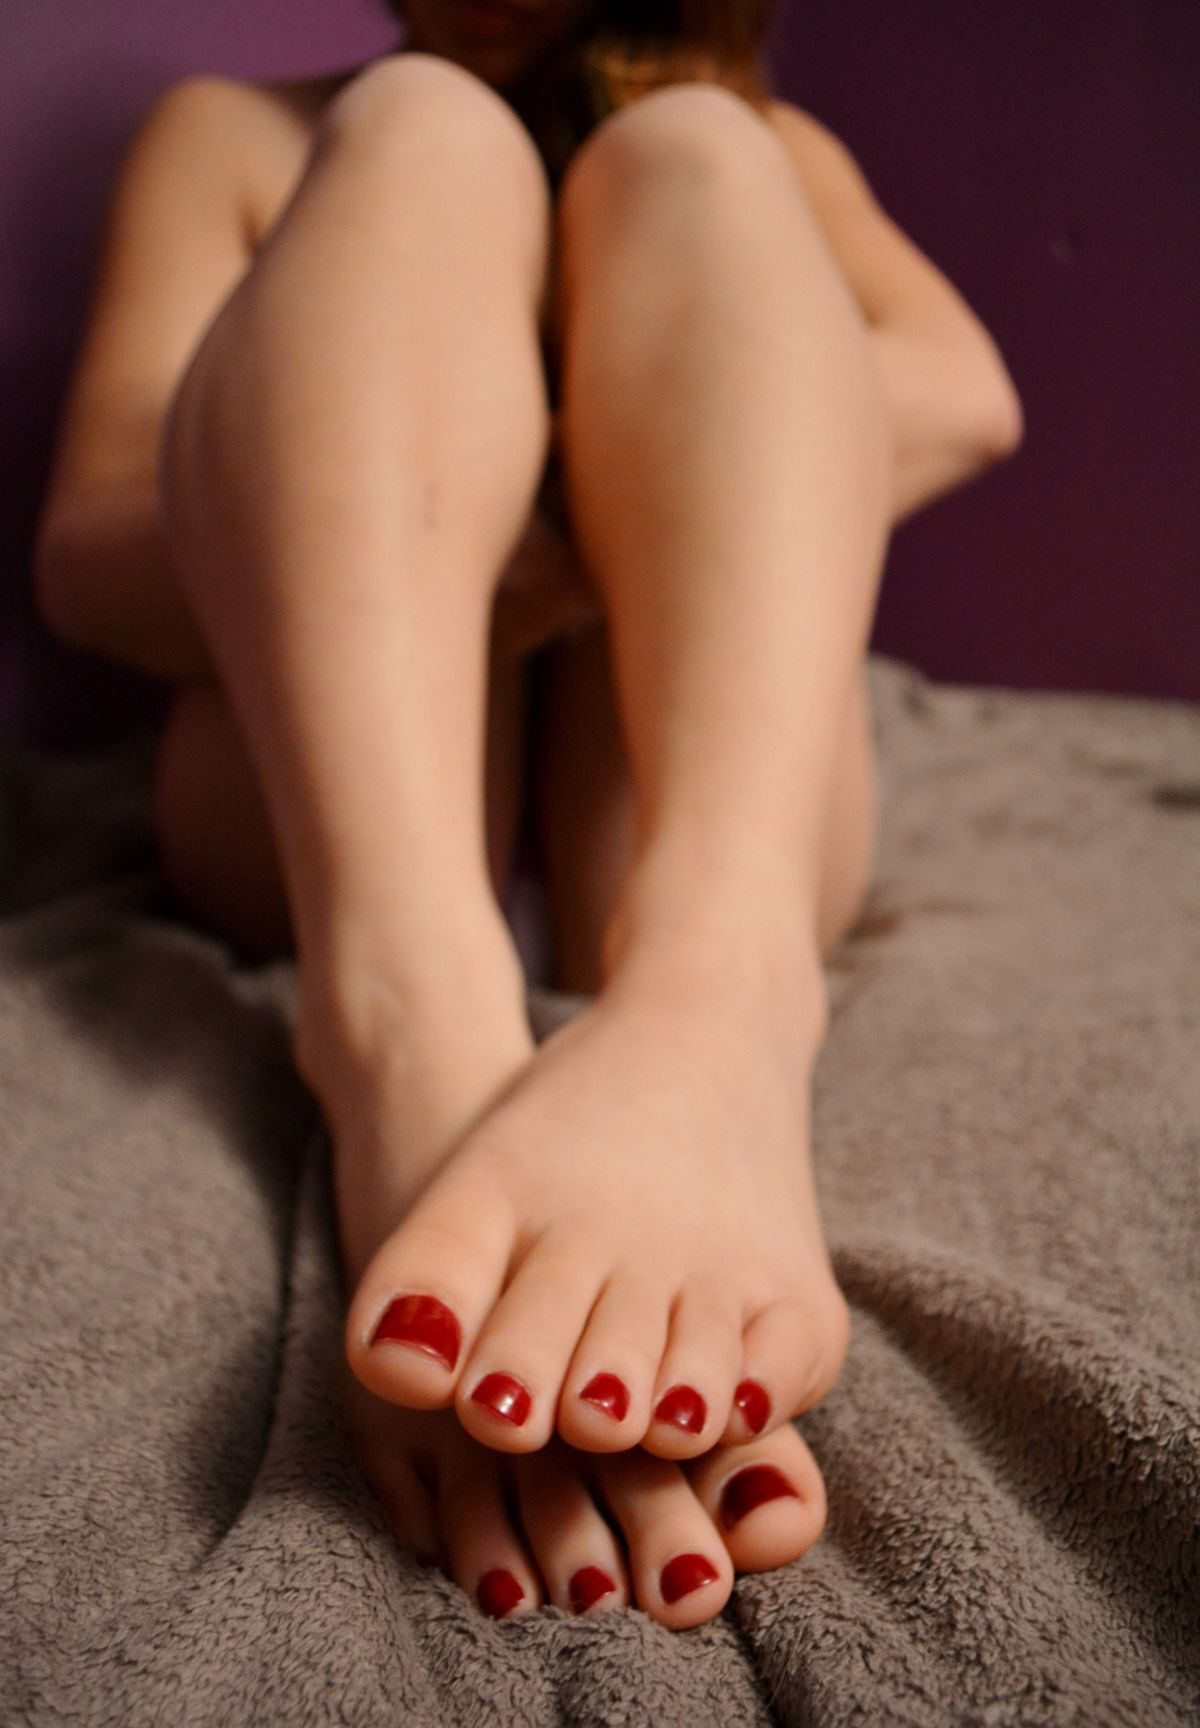 Feet Fetish Porn Photos, Sex Pictures